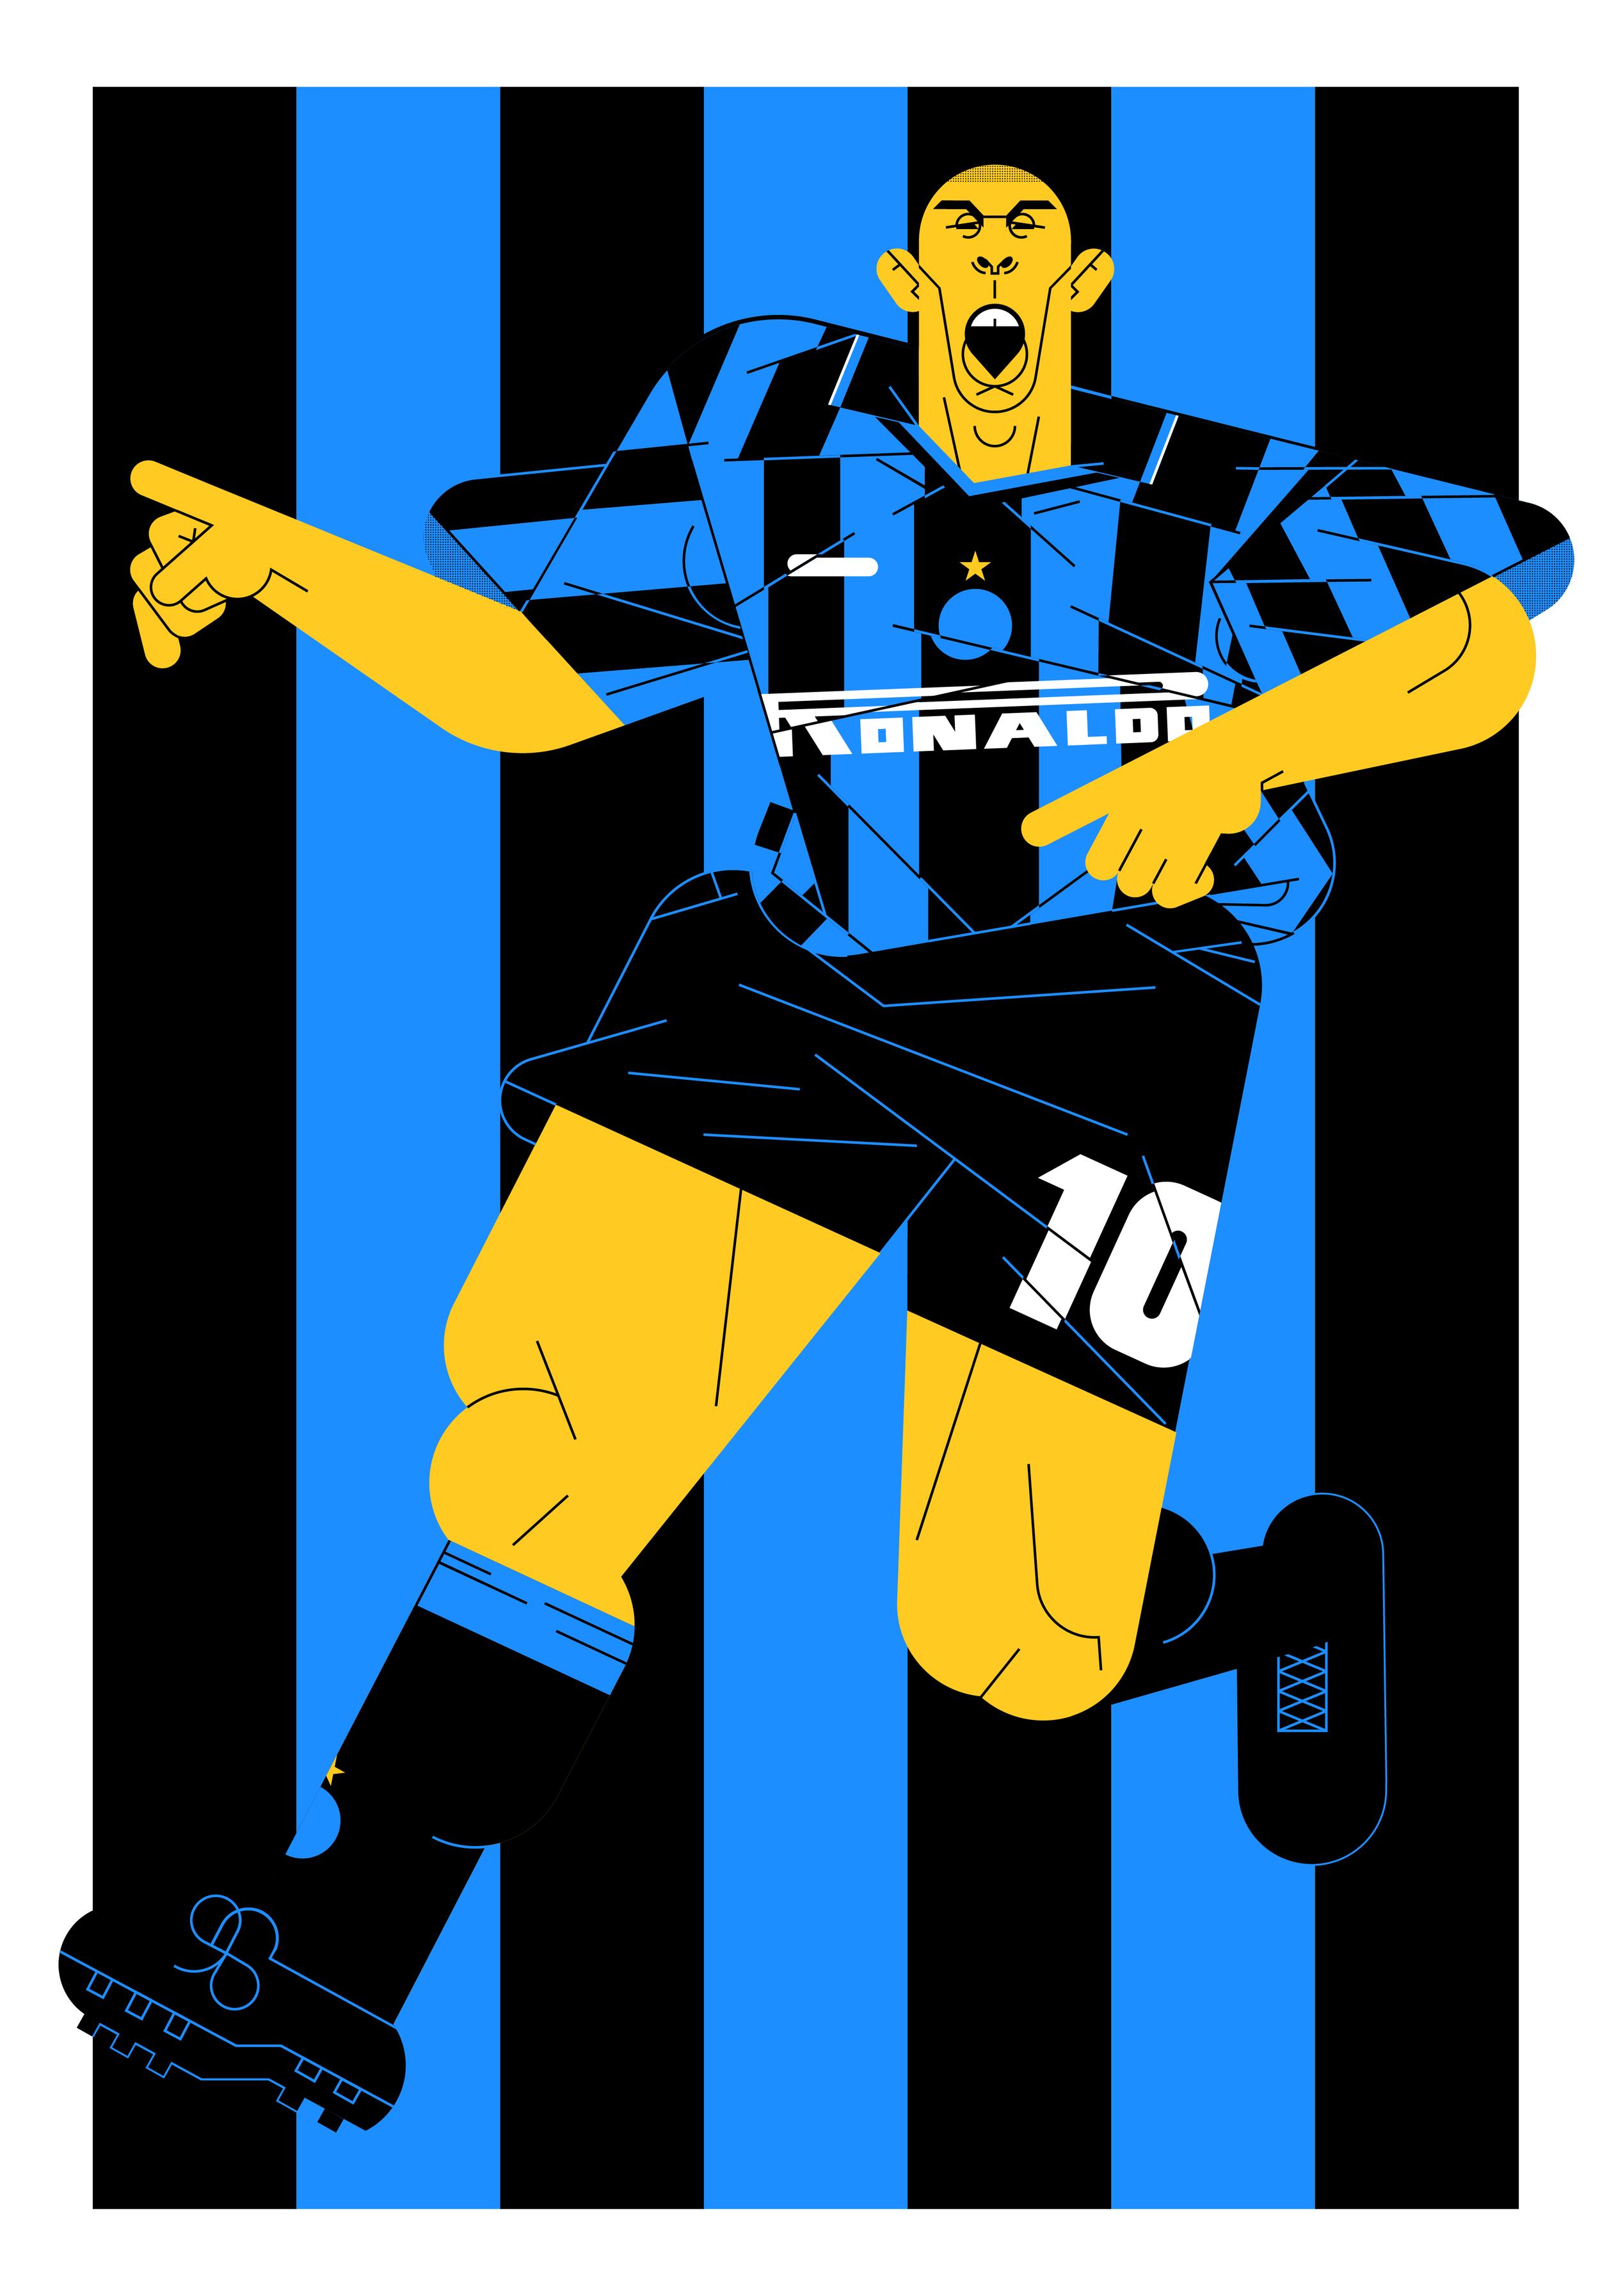 Football Players_Ronaldo inter_web.png